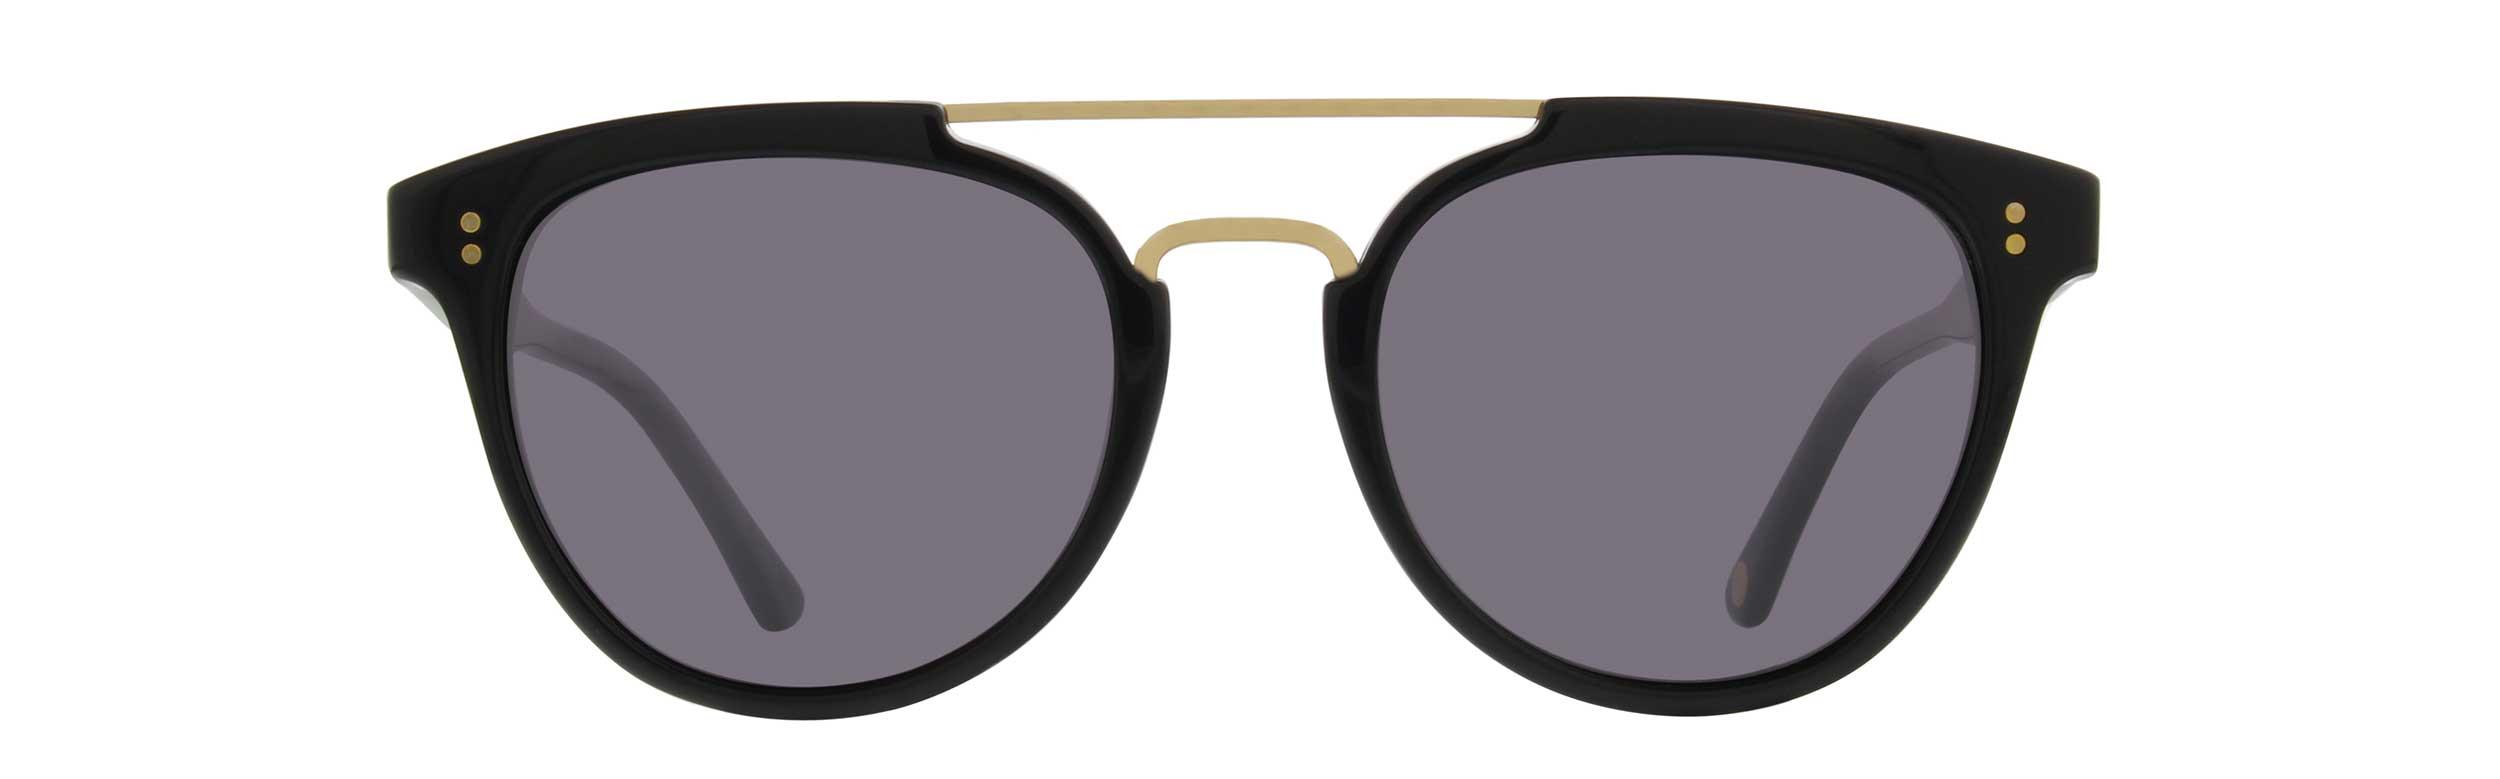 Porter Square Sunglasses